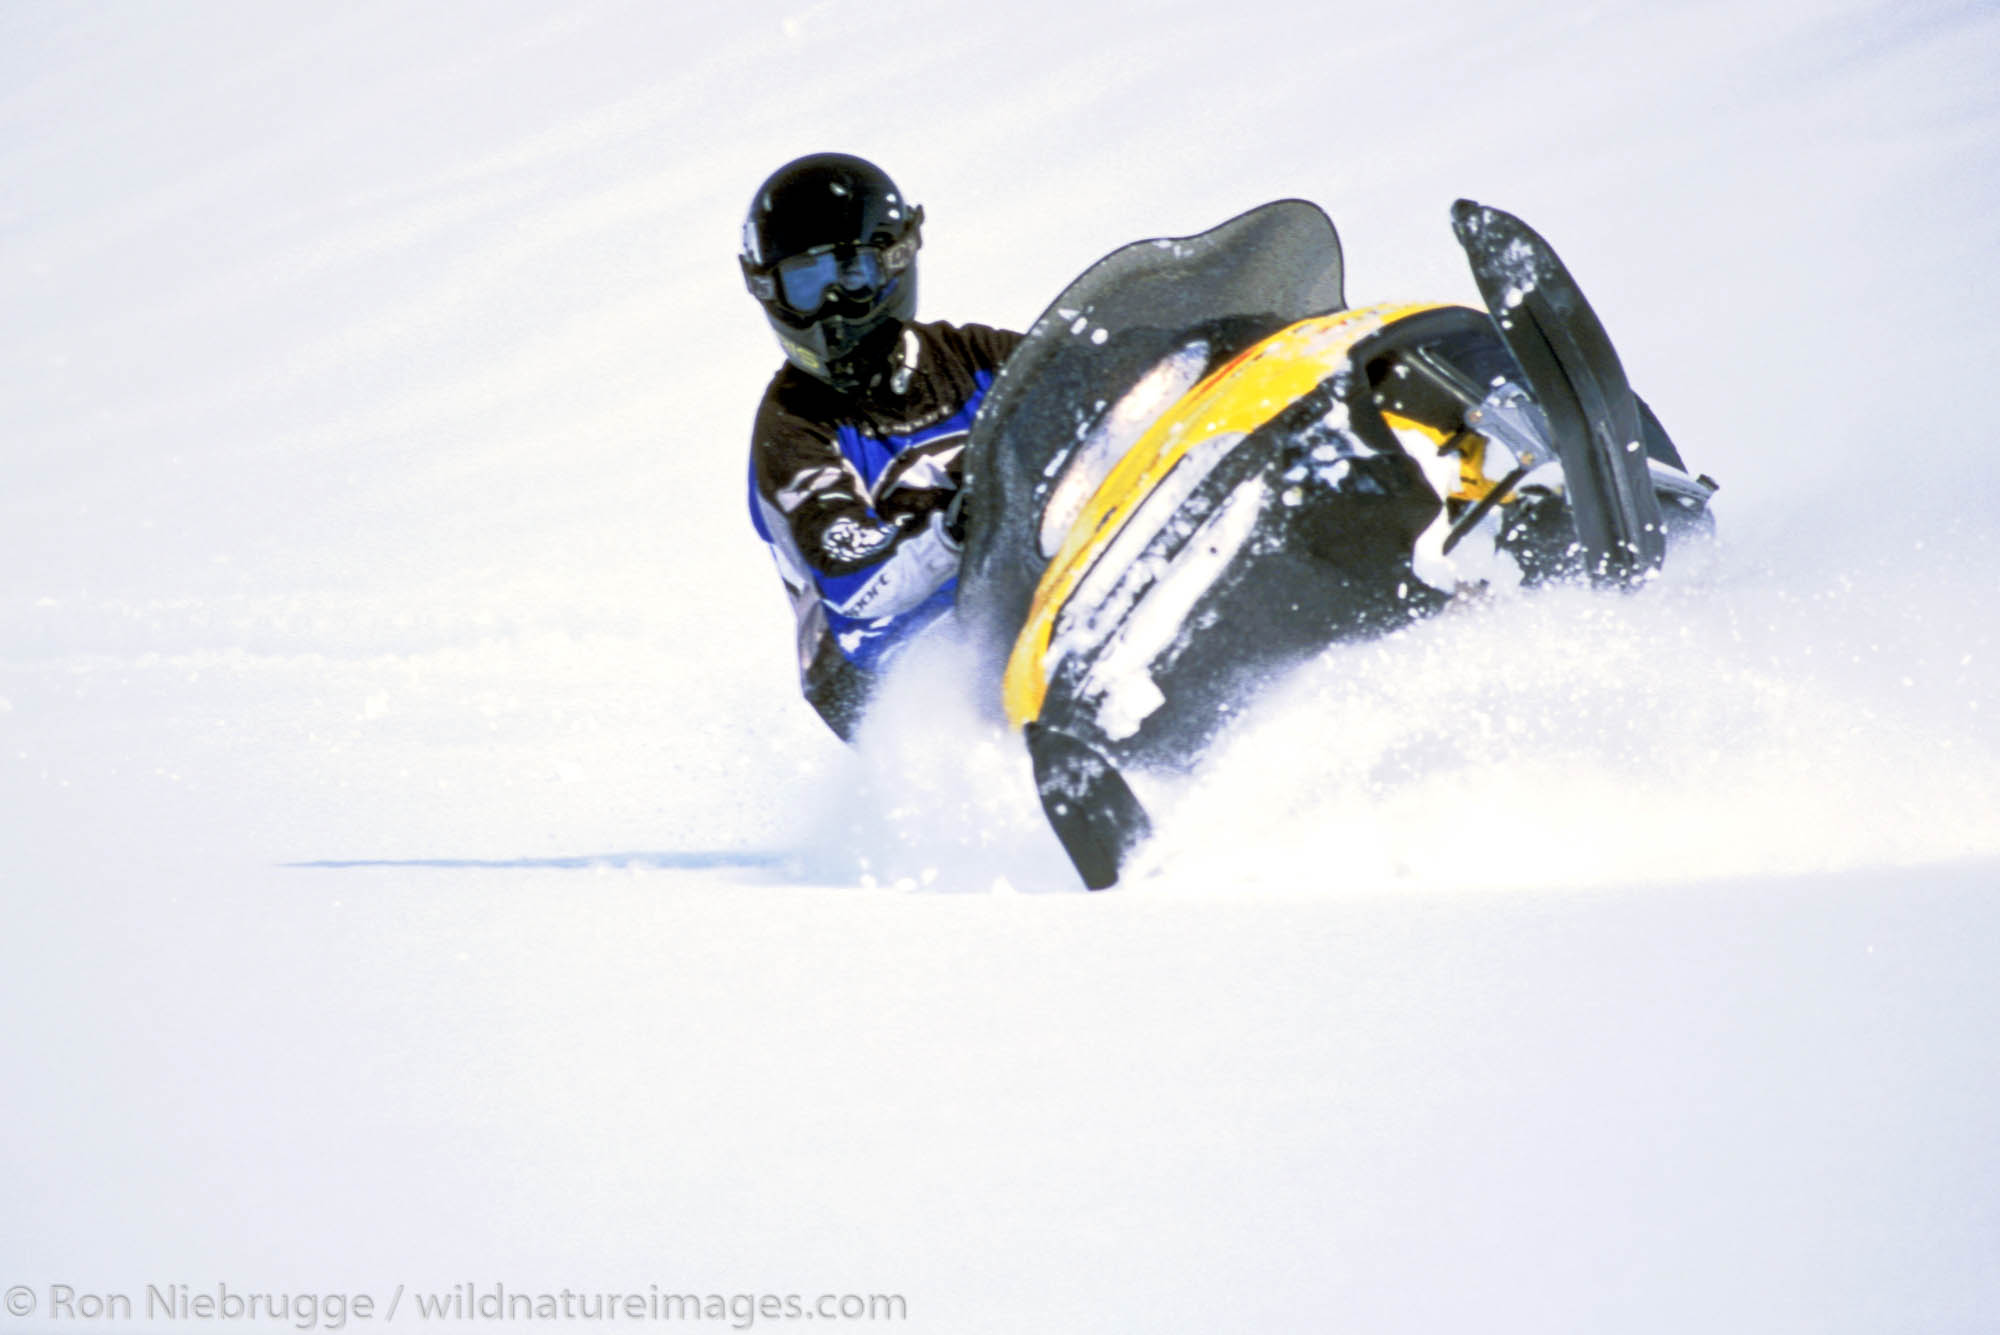 Snowmachine riding, Lost Lake, Chugach National Forest, Alaska. MR/PR